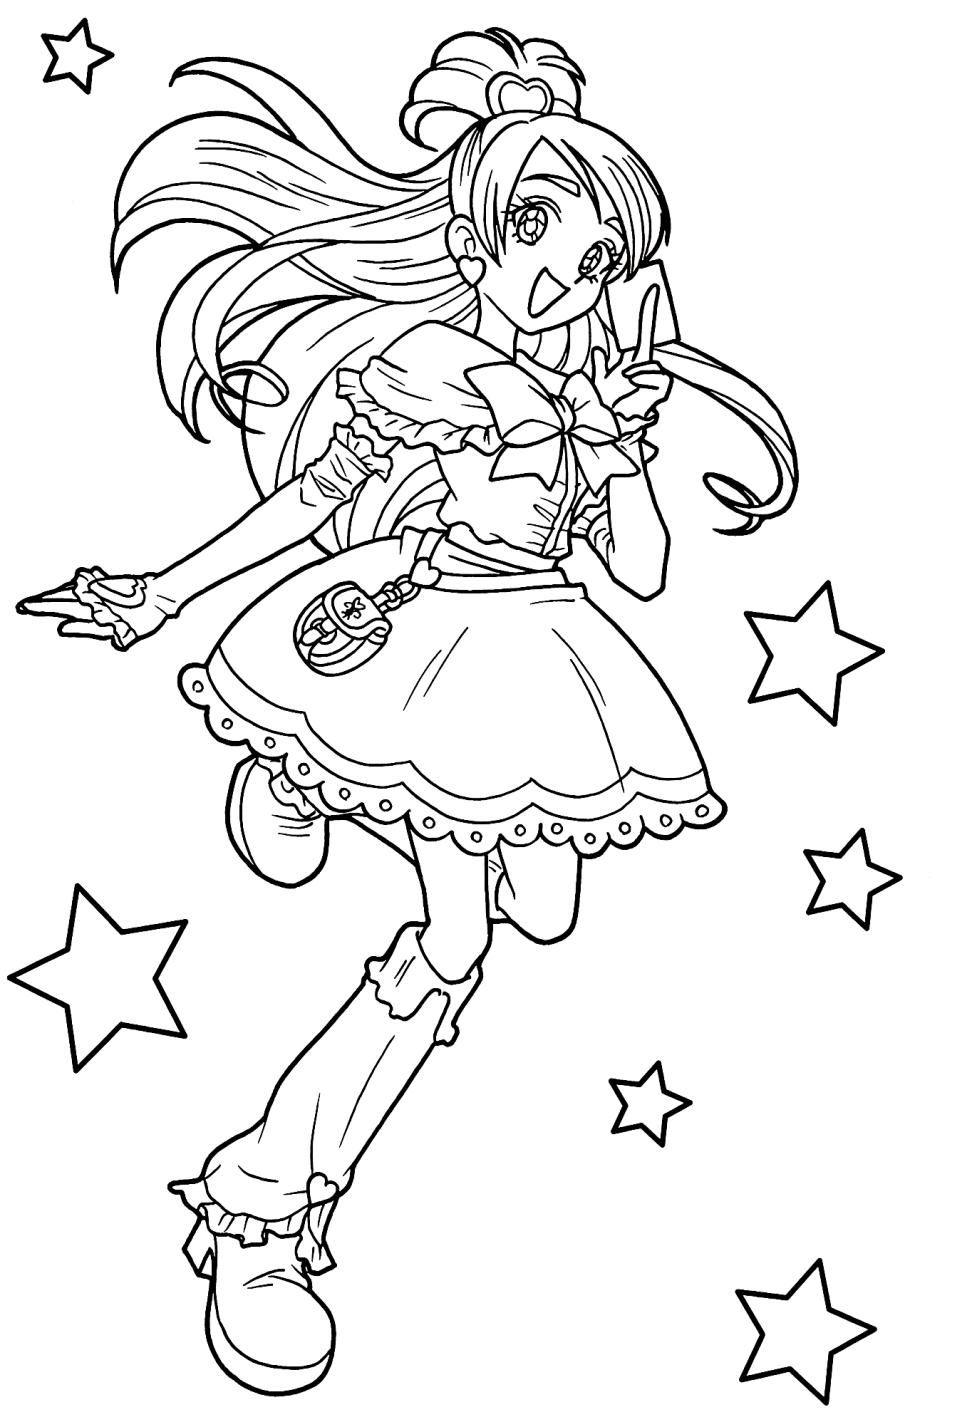 Desenho 17 de Glitter Force para imprimir e colorir